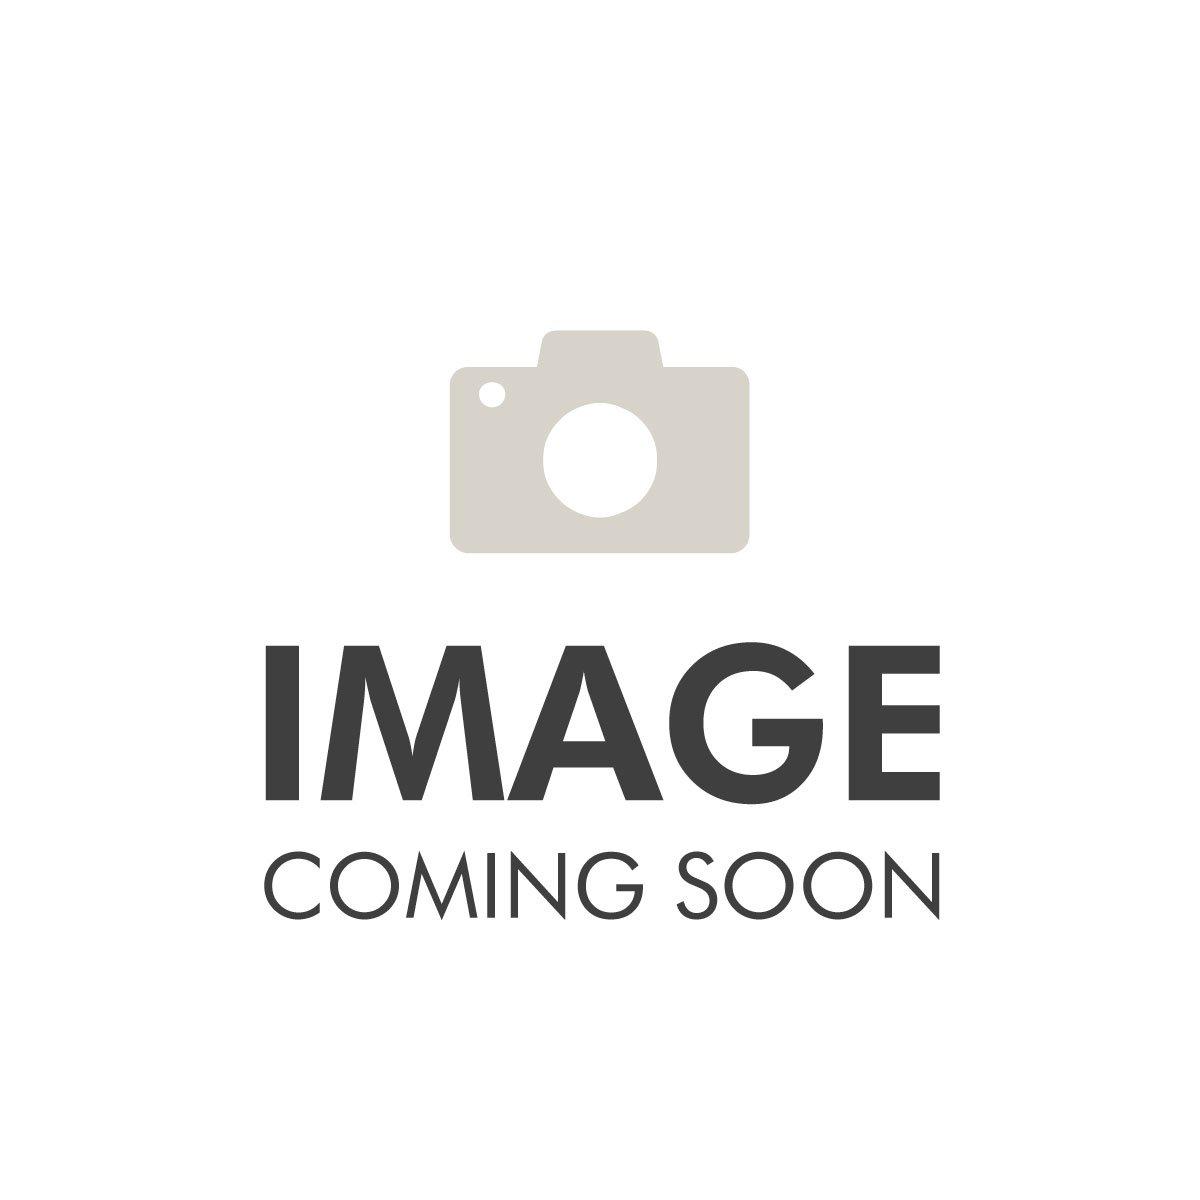 Clarins Hand And Nail Treatment Cream 2x100ml